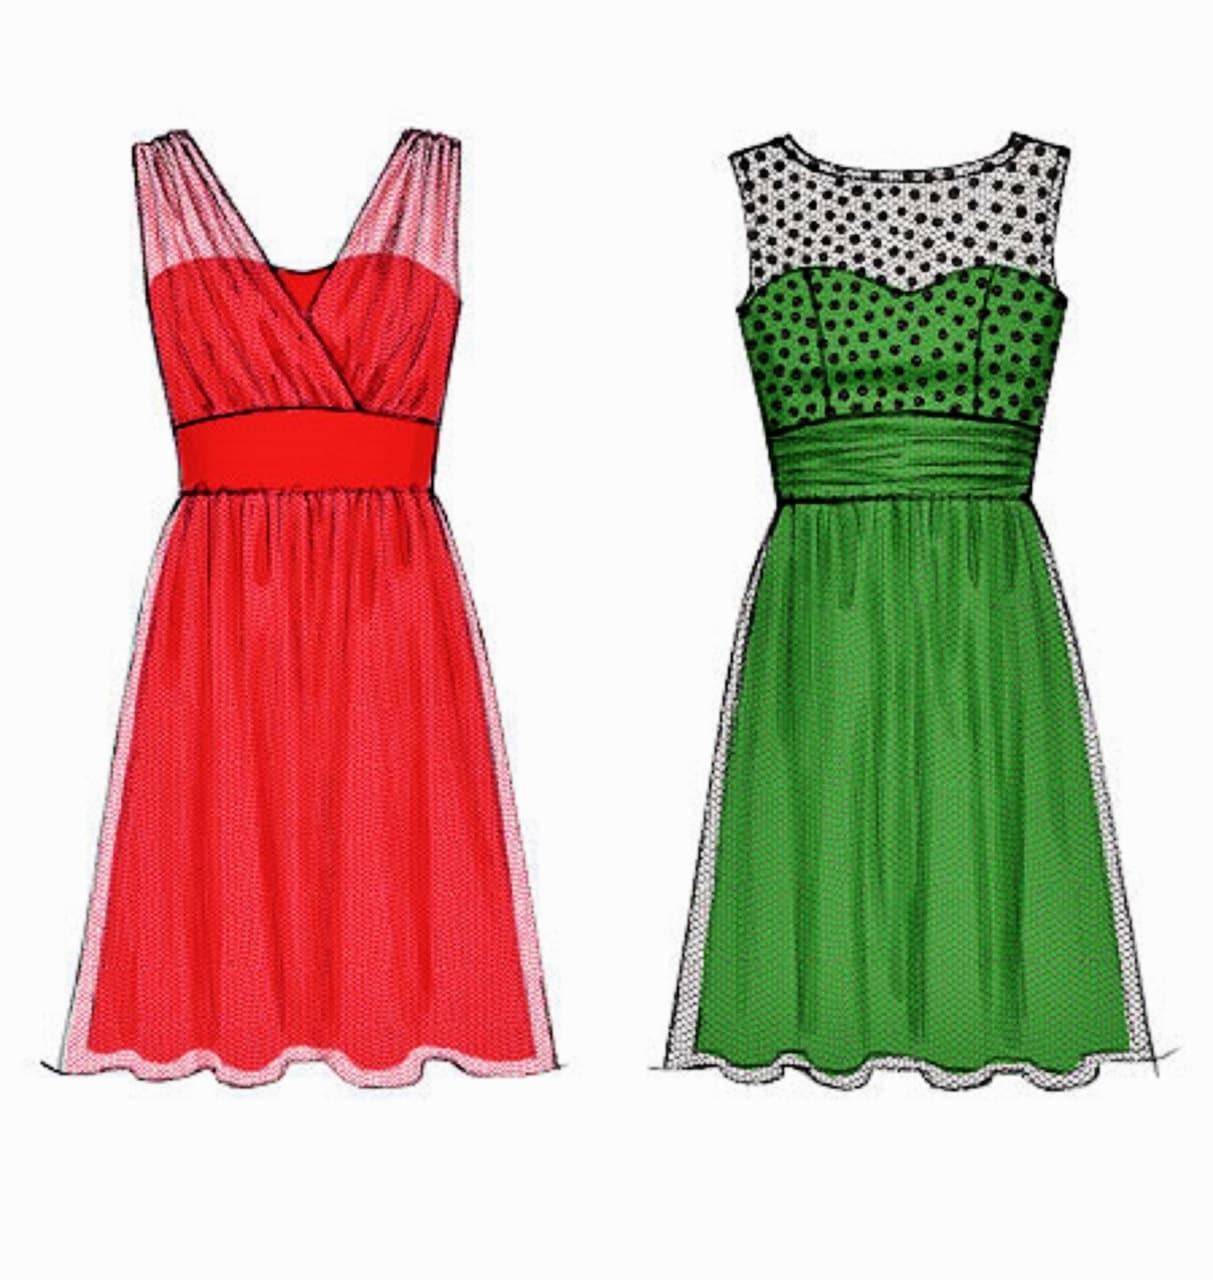 Prom Dress Pattern Evening Gown Create It Dress Sz 8 To 16